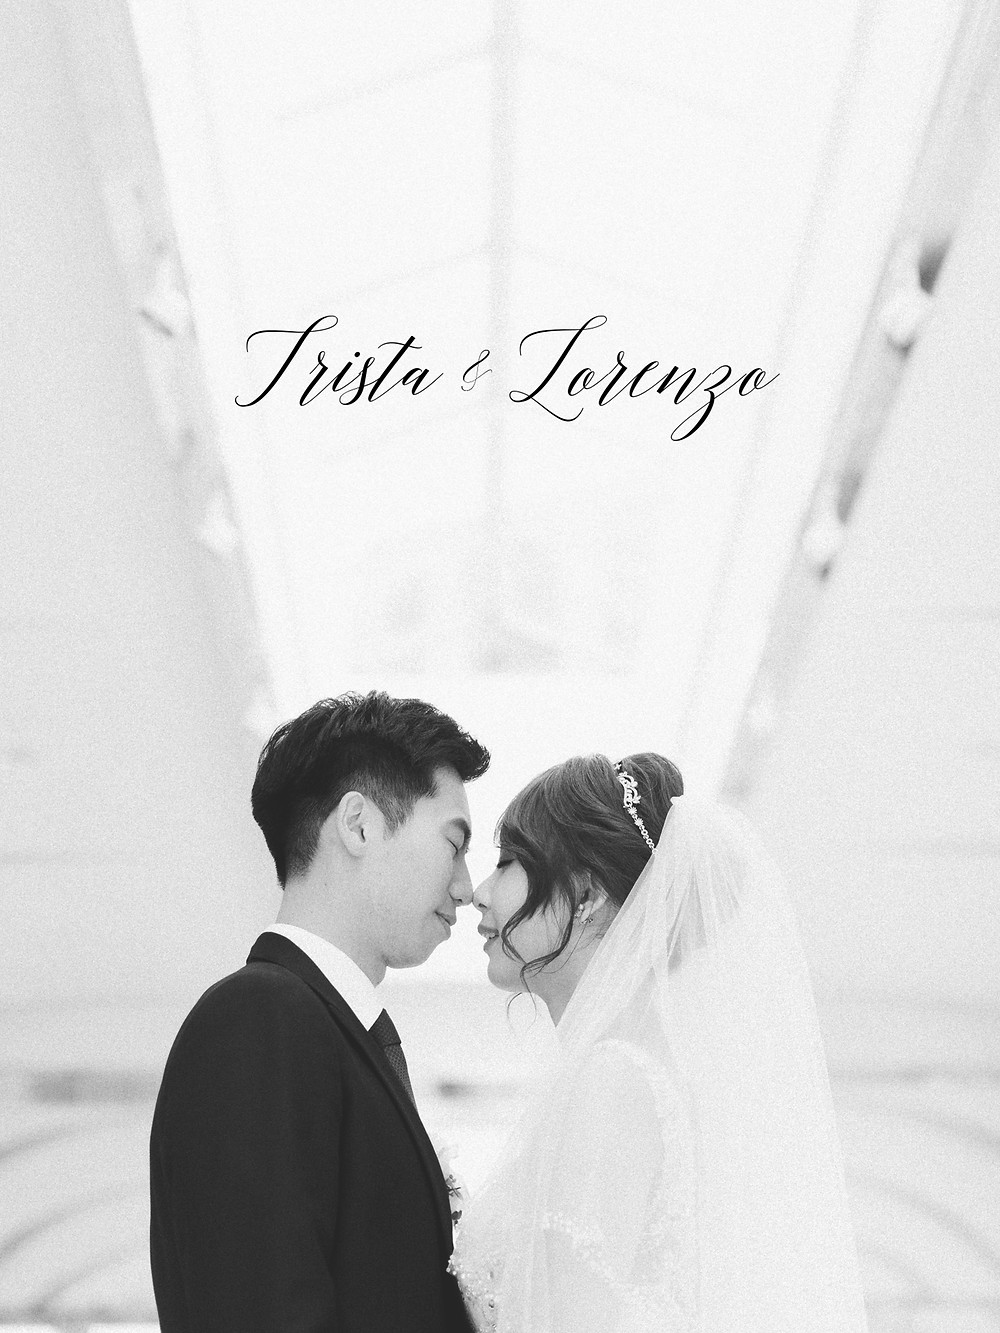 Trista & Lorenzo Wedding |  Denwell 新莊典華, Taiwan 美式婚禮